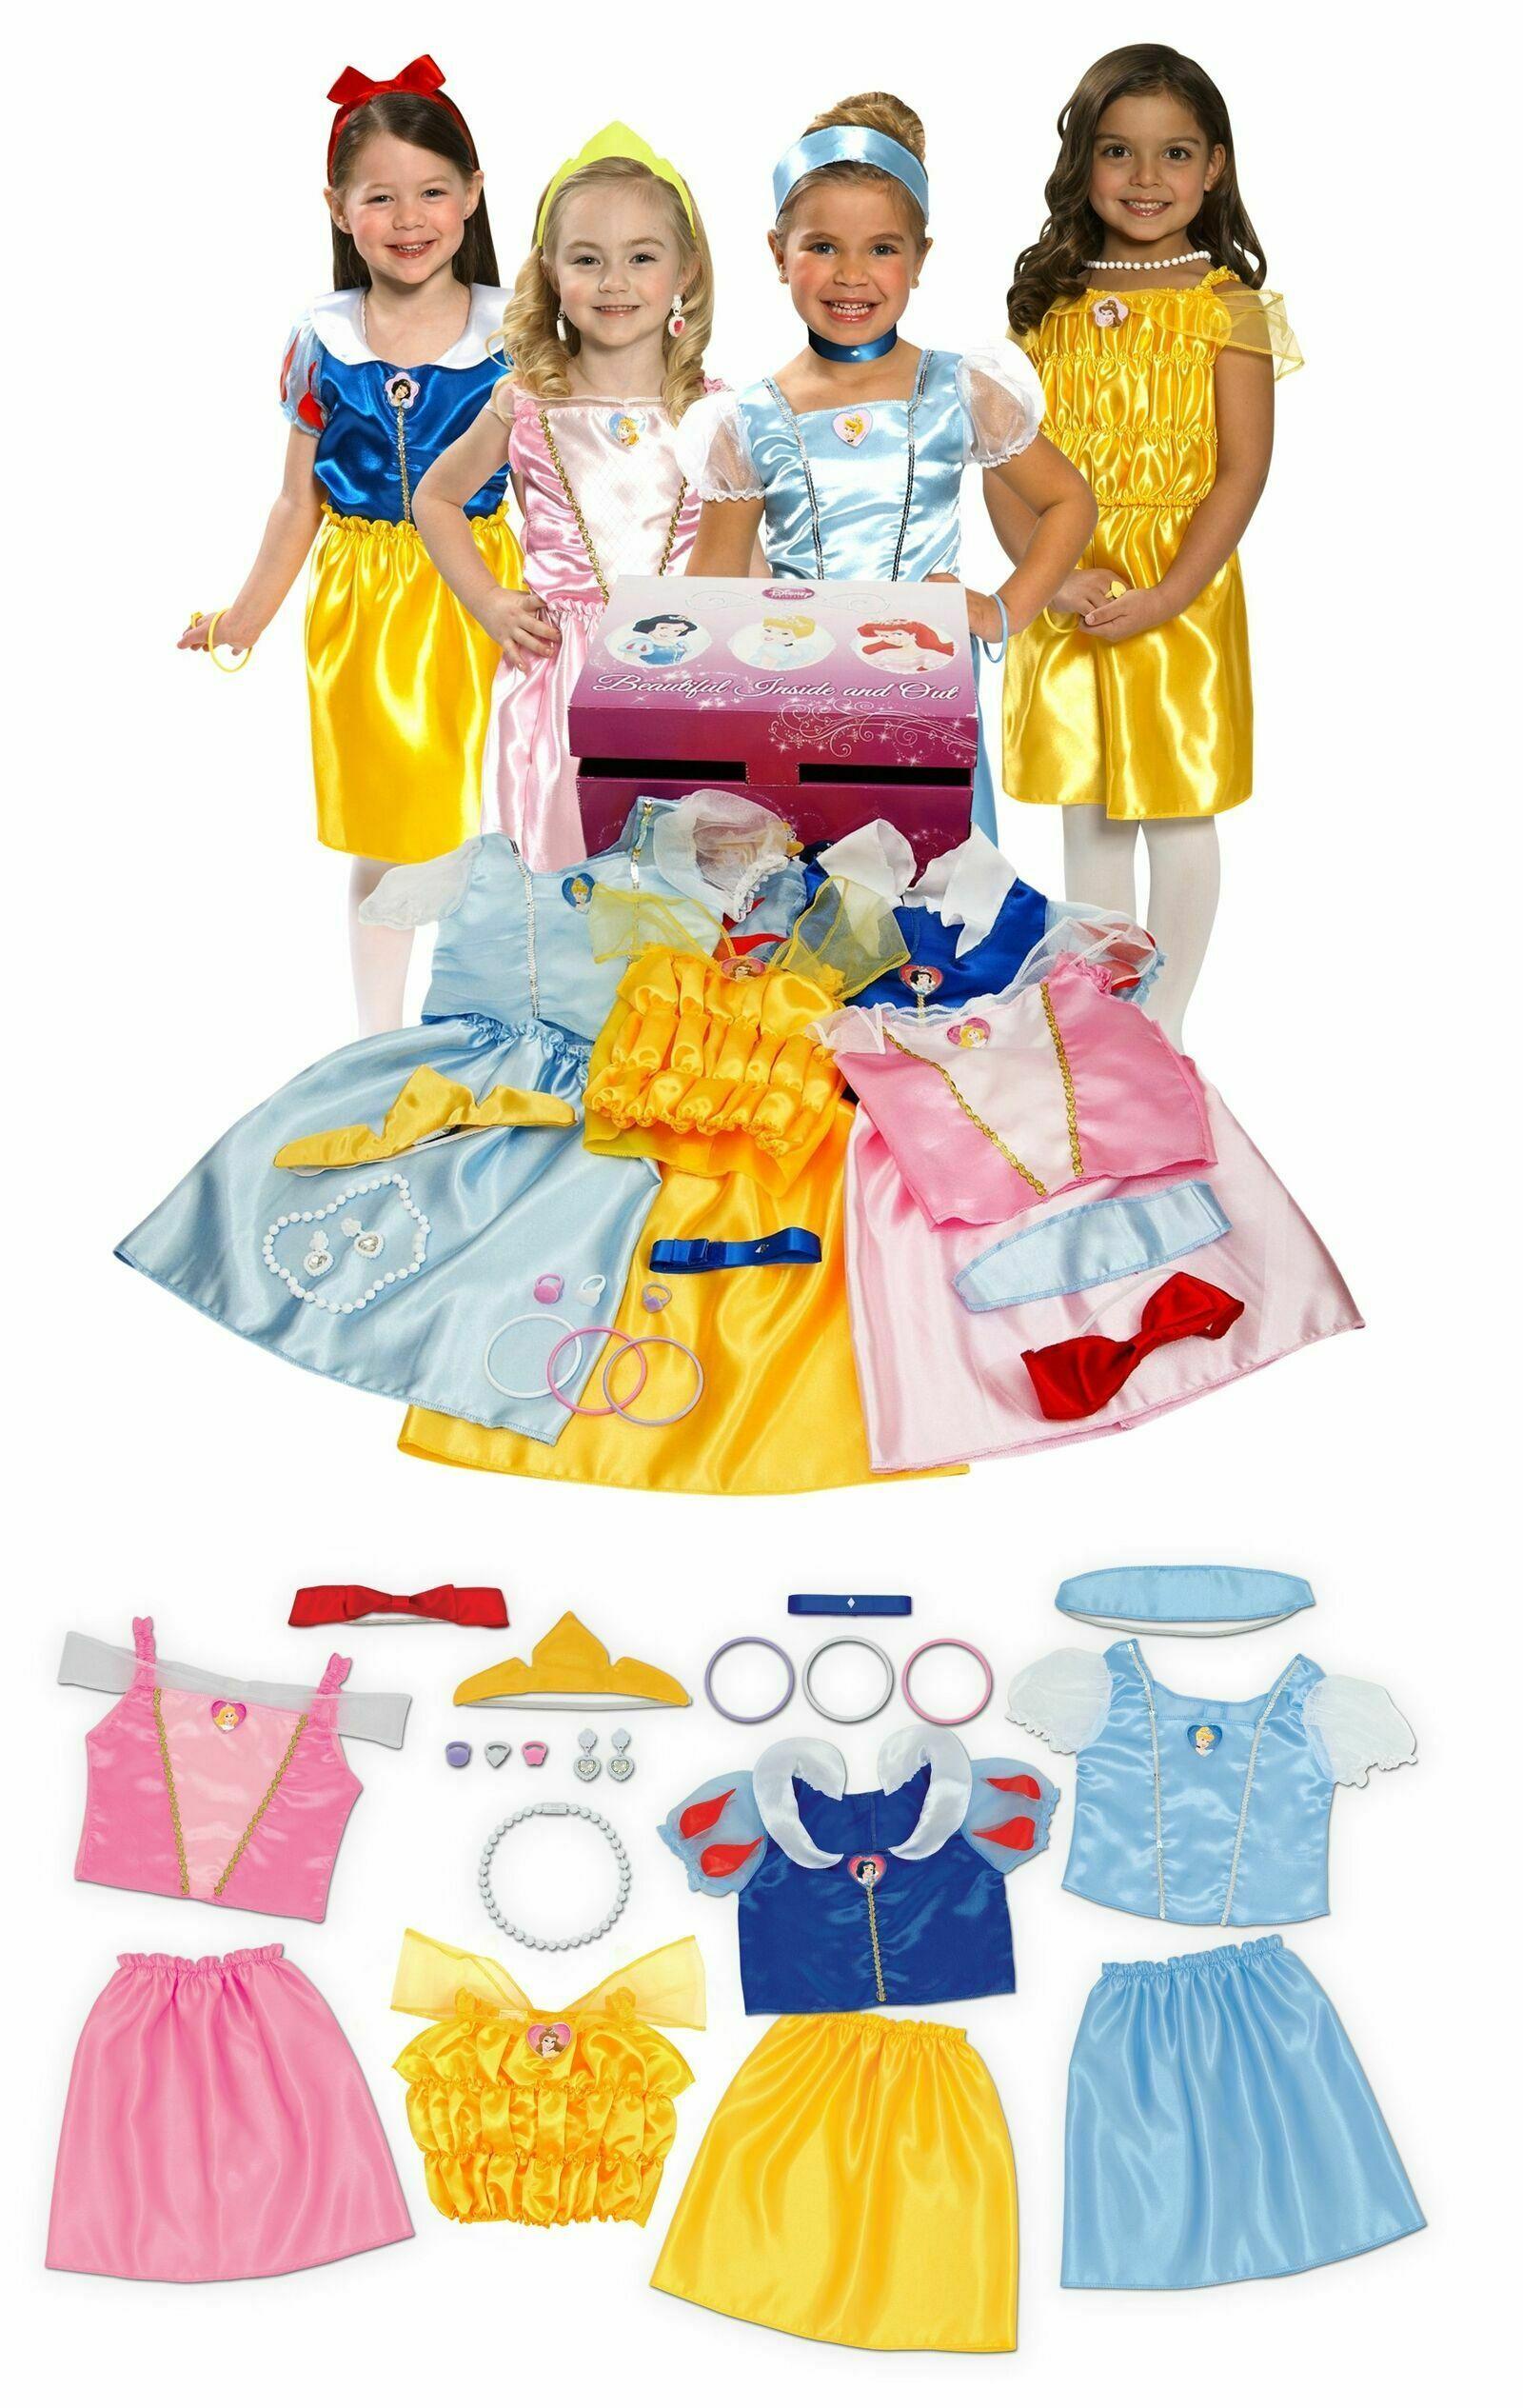 Dressup costumes 19172 disney princess royal dress up